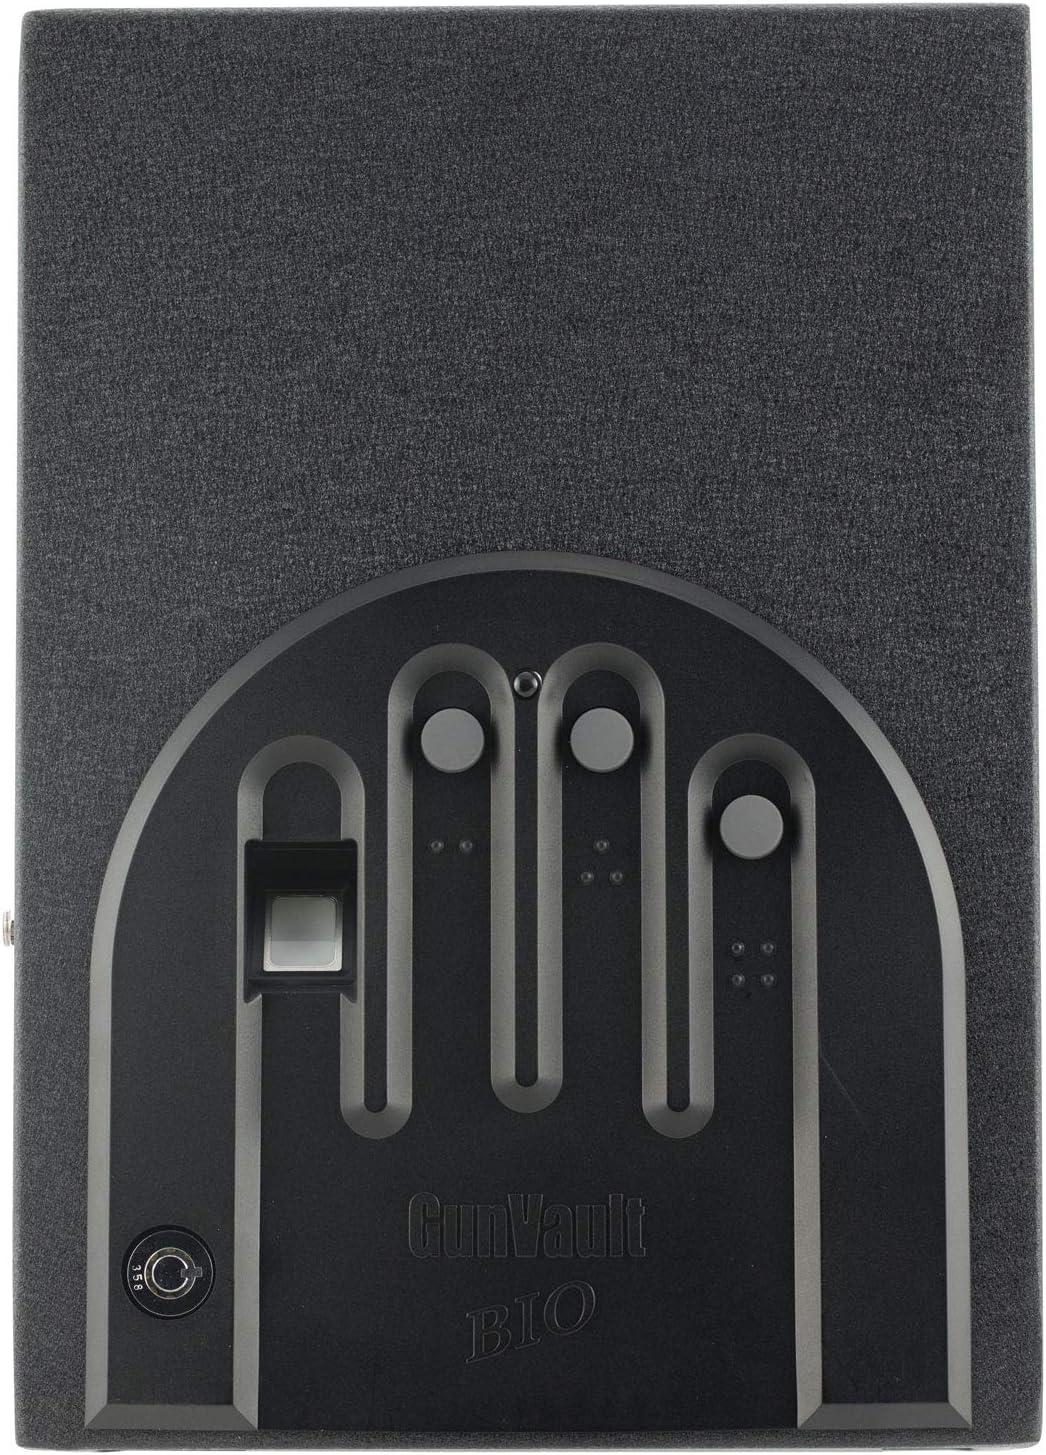 B001ABLN4A GunVault Minivault Biometric Biometric Pistol Safe GVB1000 81vAcol6ApL